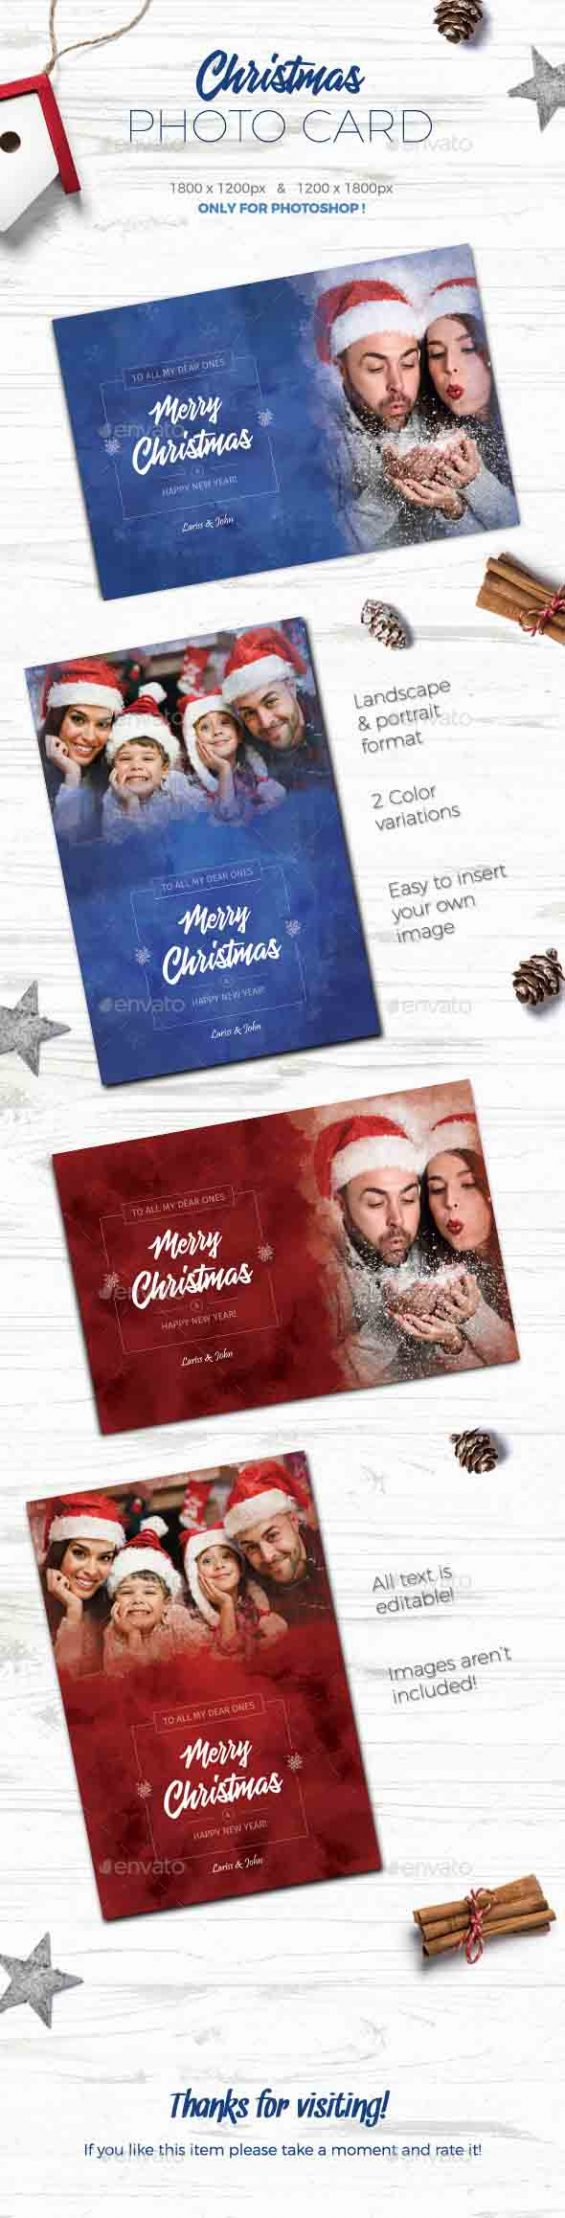 Christmas Photo Card Sample